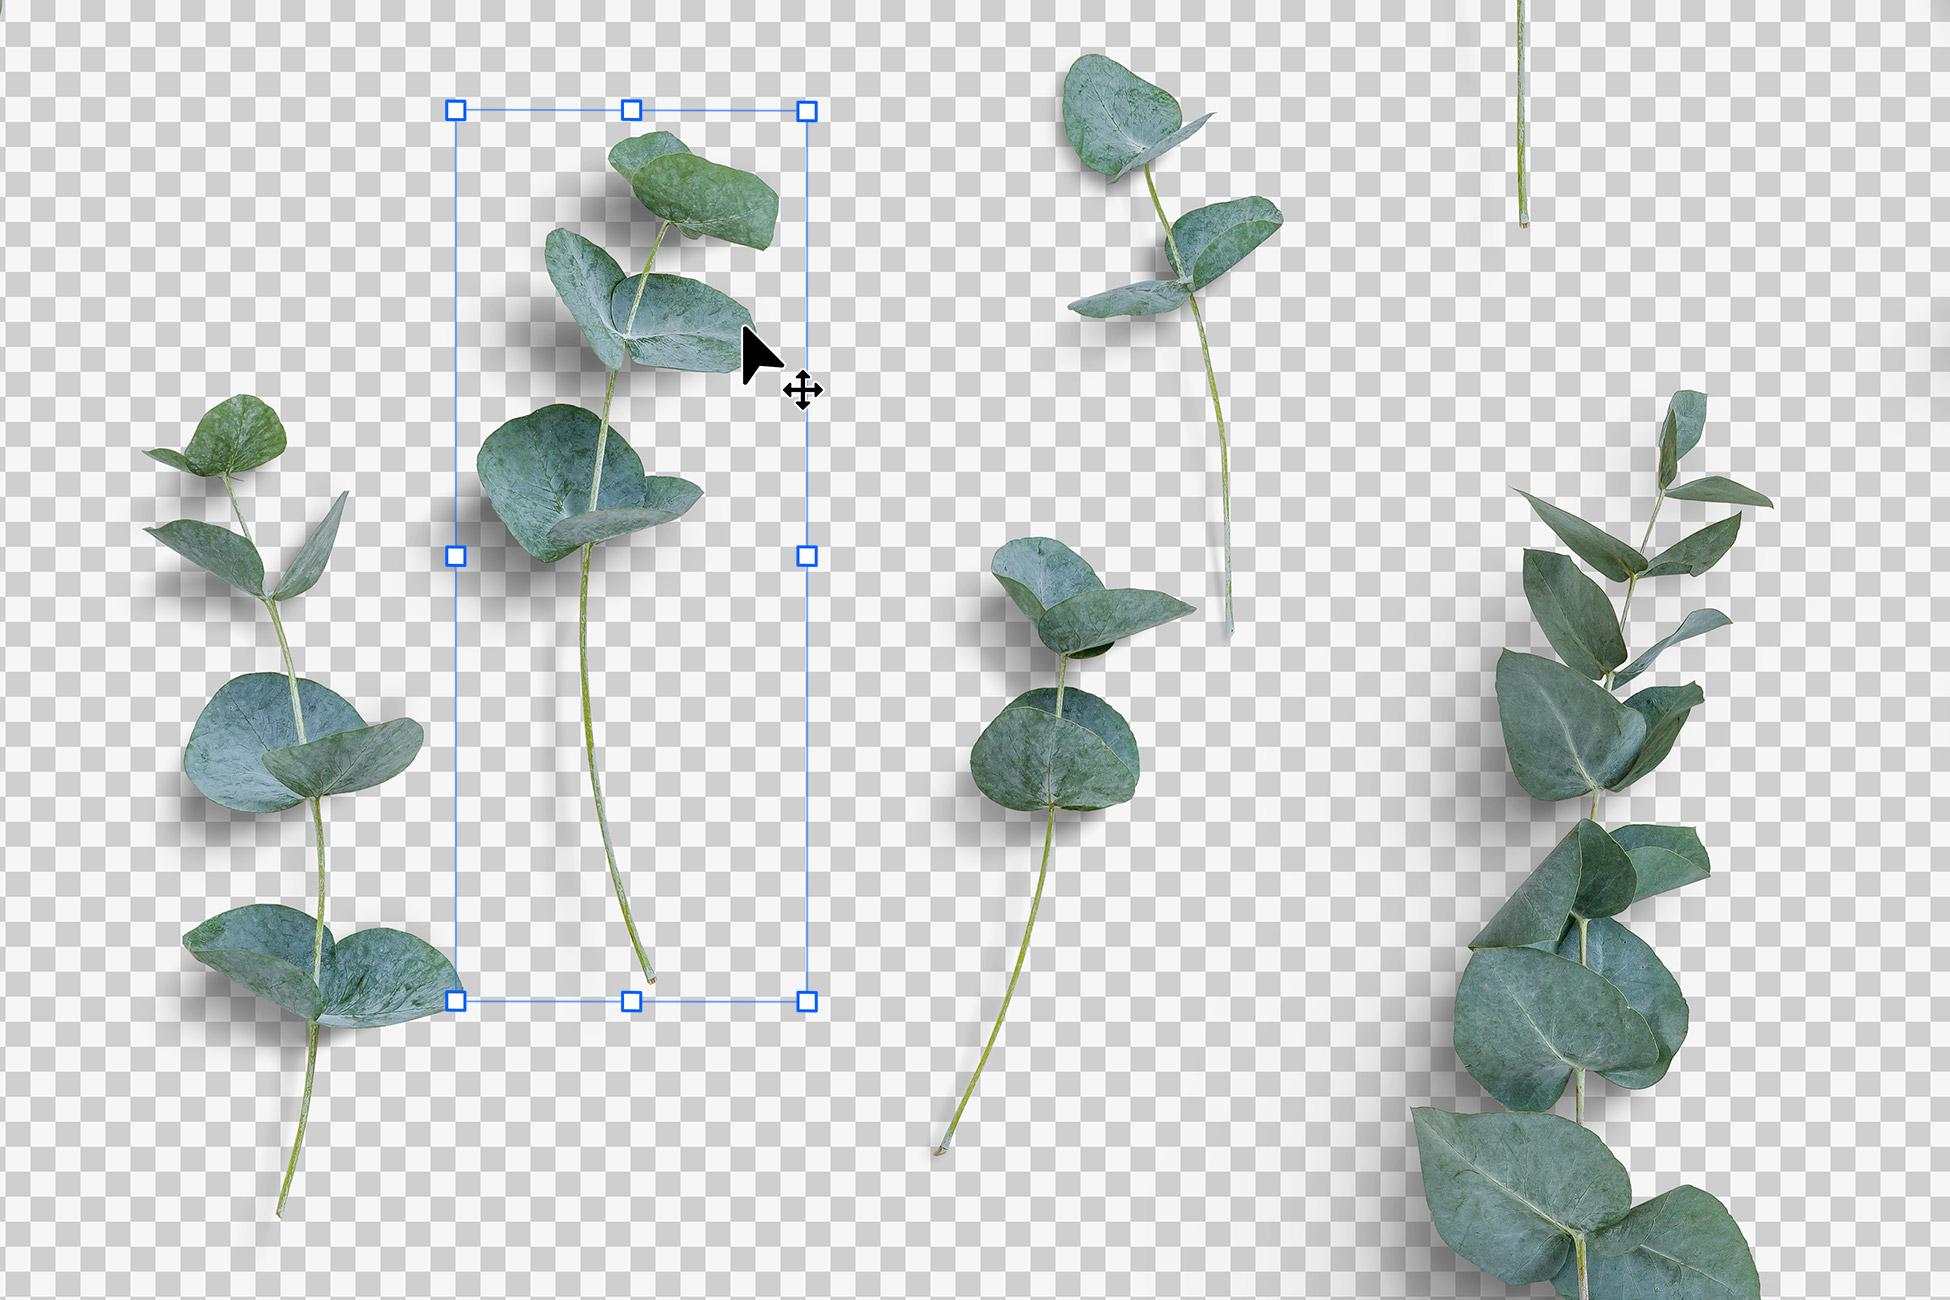 Eucaliptus Isolated Objects